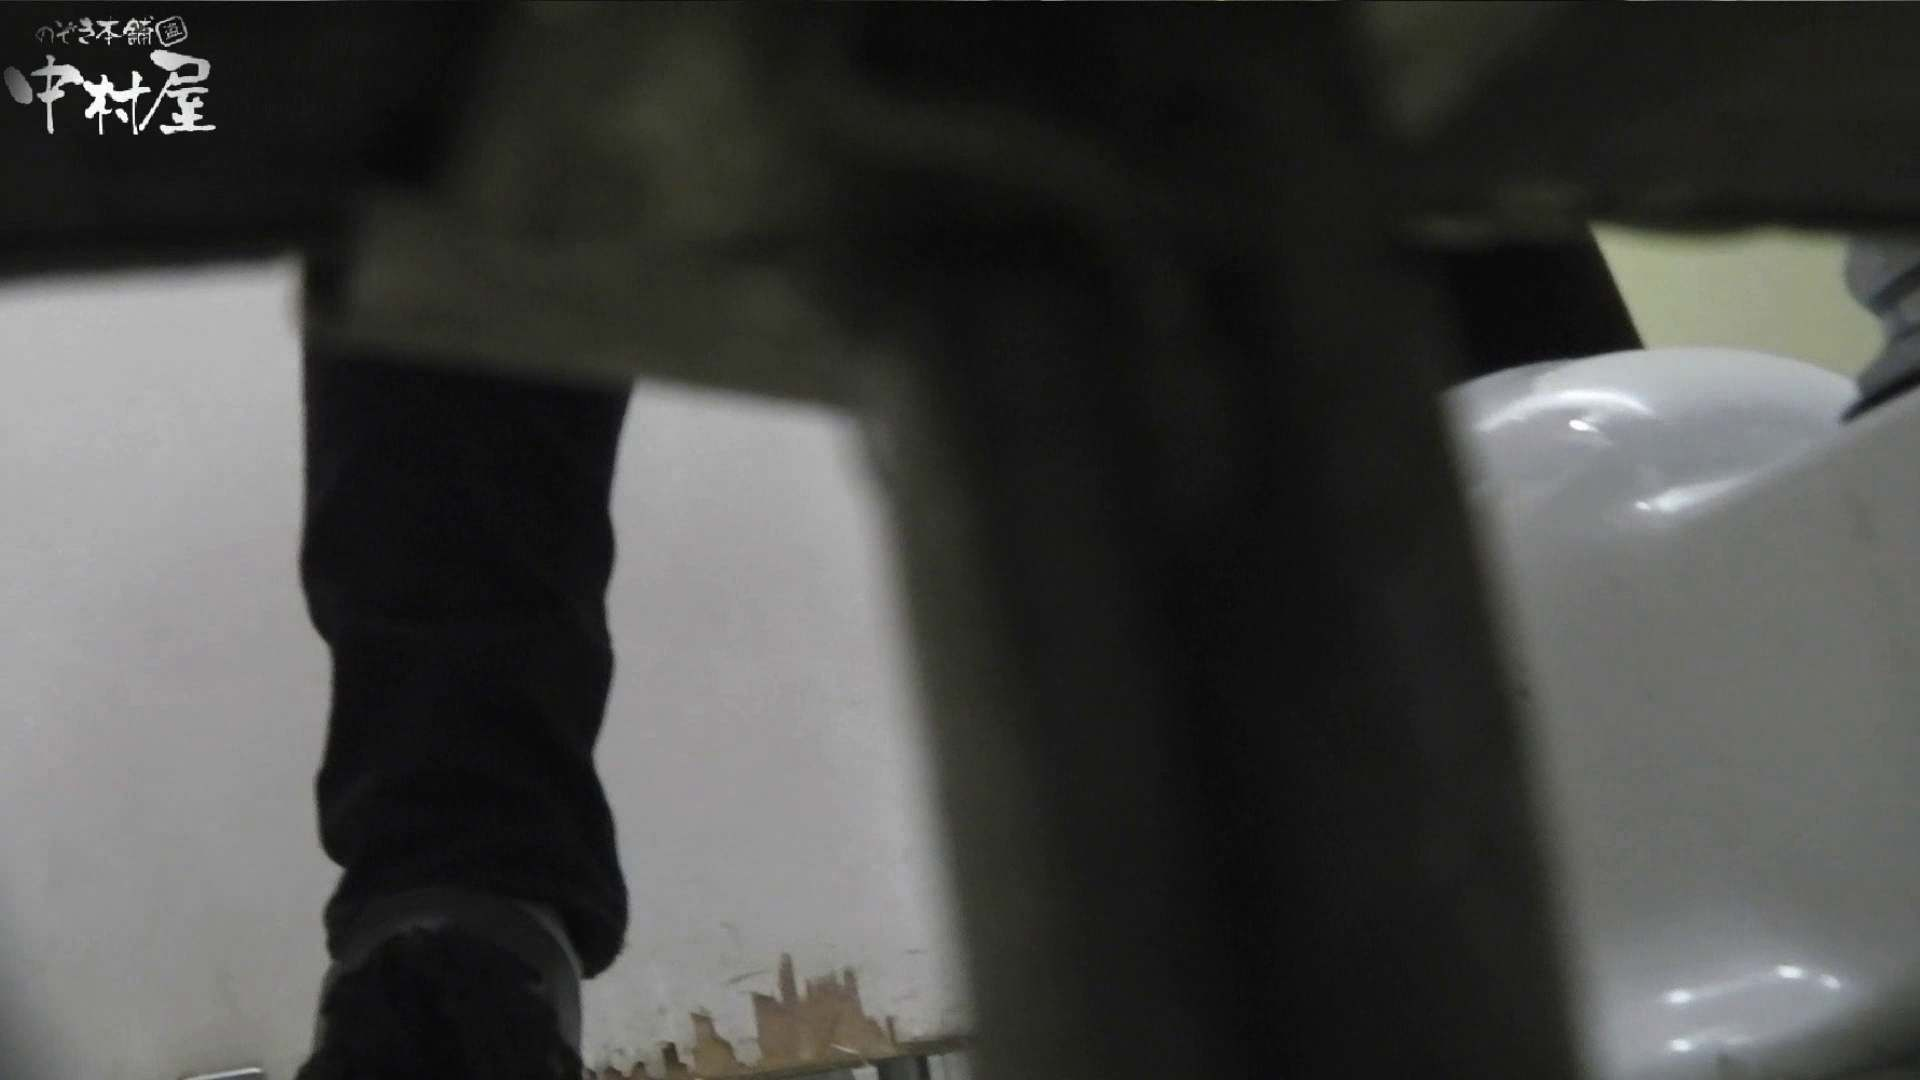 vol.49 命がけ潜伏洗面所! ポニテたんのソフトなブツ・推定180g 洗面所編 オマンコ無修正動画無料 77PIX 71